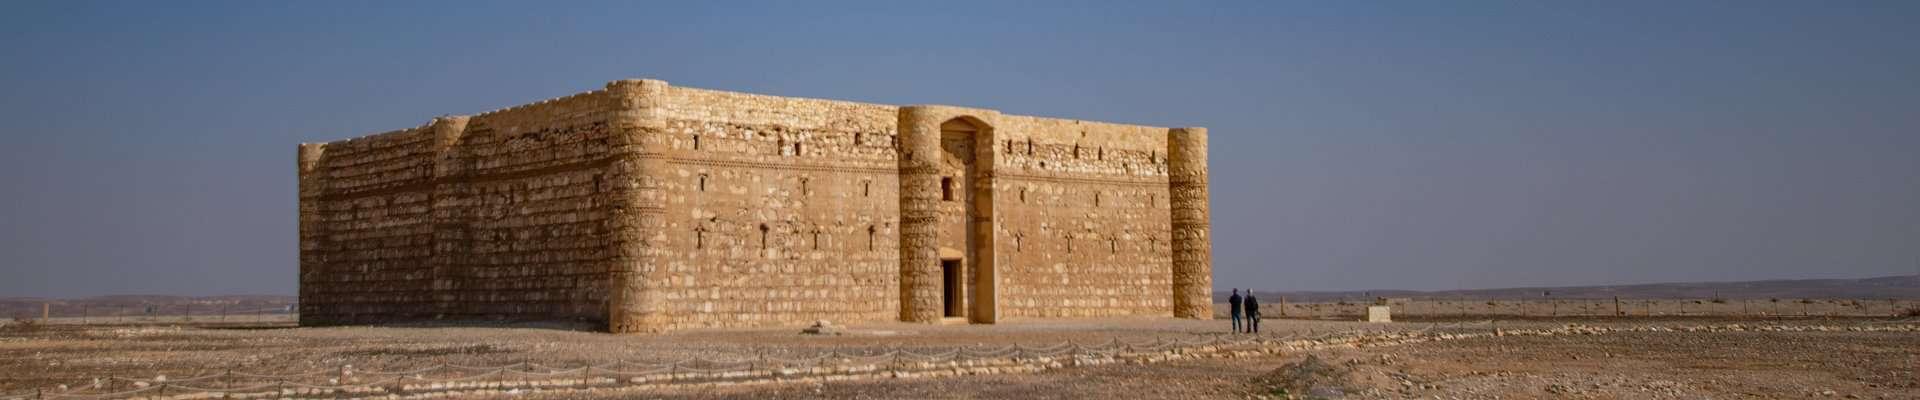 The striking Umayyad Palace of Qasr Al-Kharanah in the open Jordanian desert.